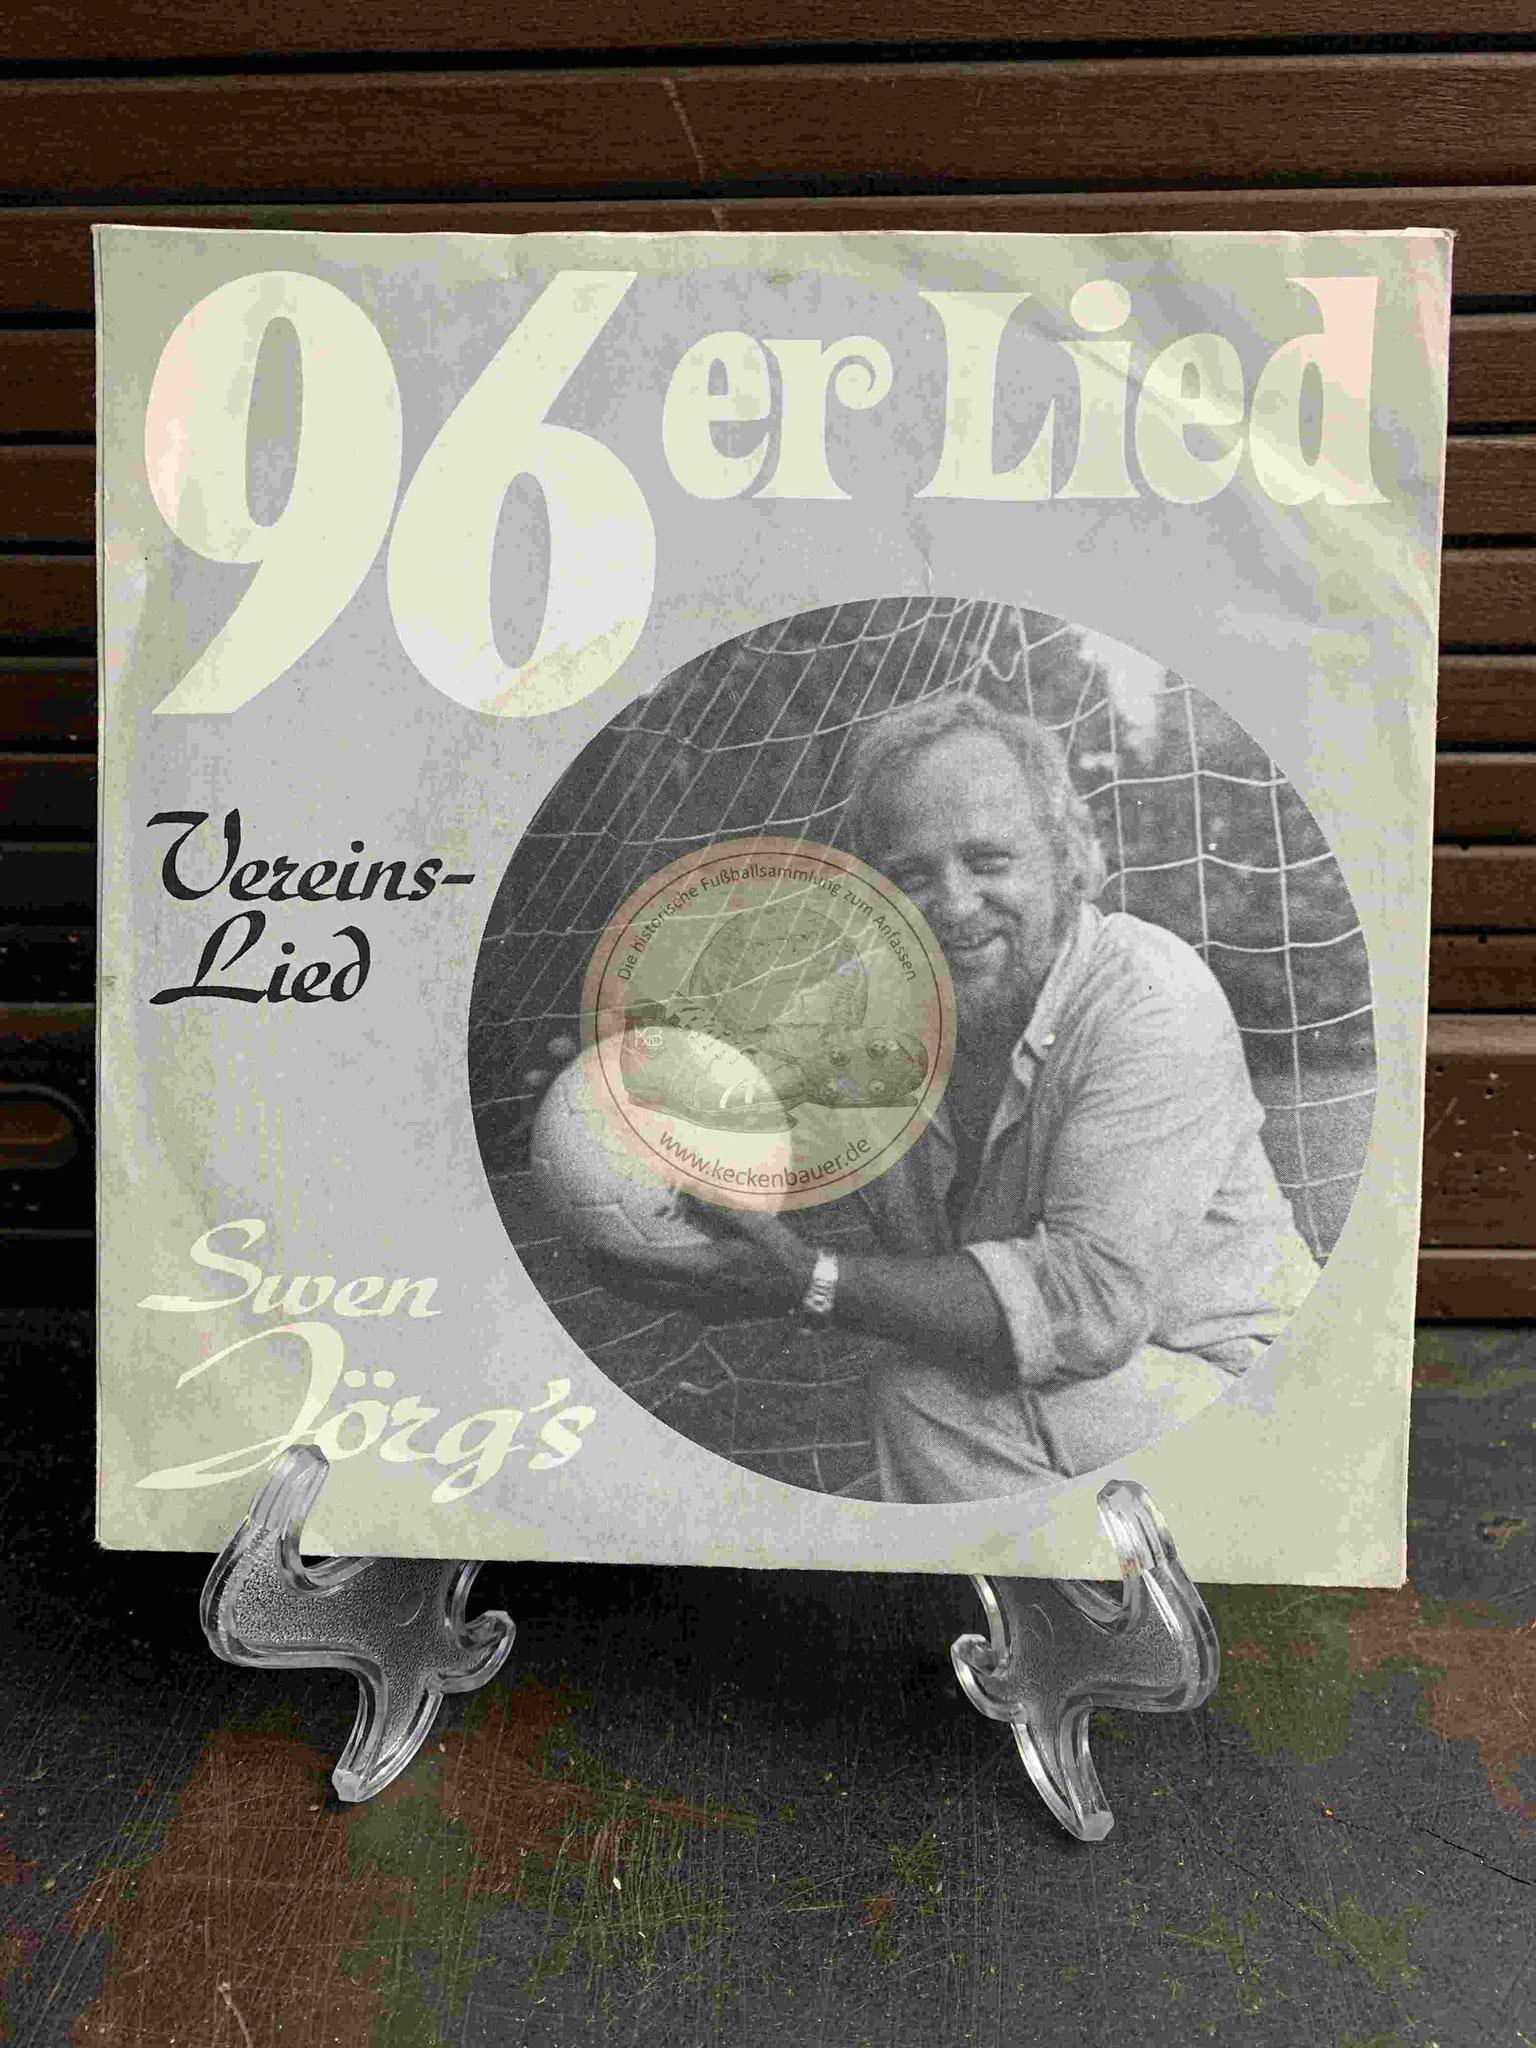 1985 96er Lied Vereinslied Swen Jörg´s